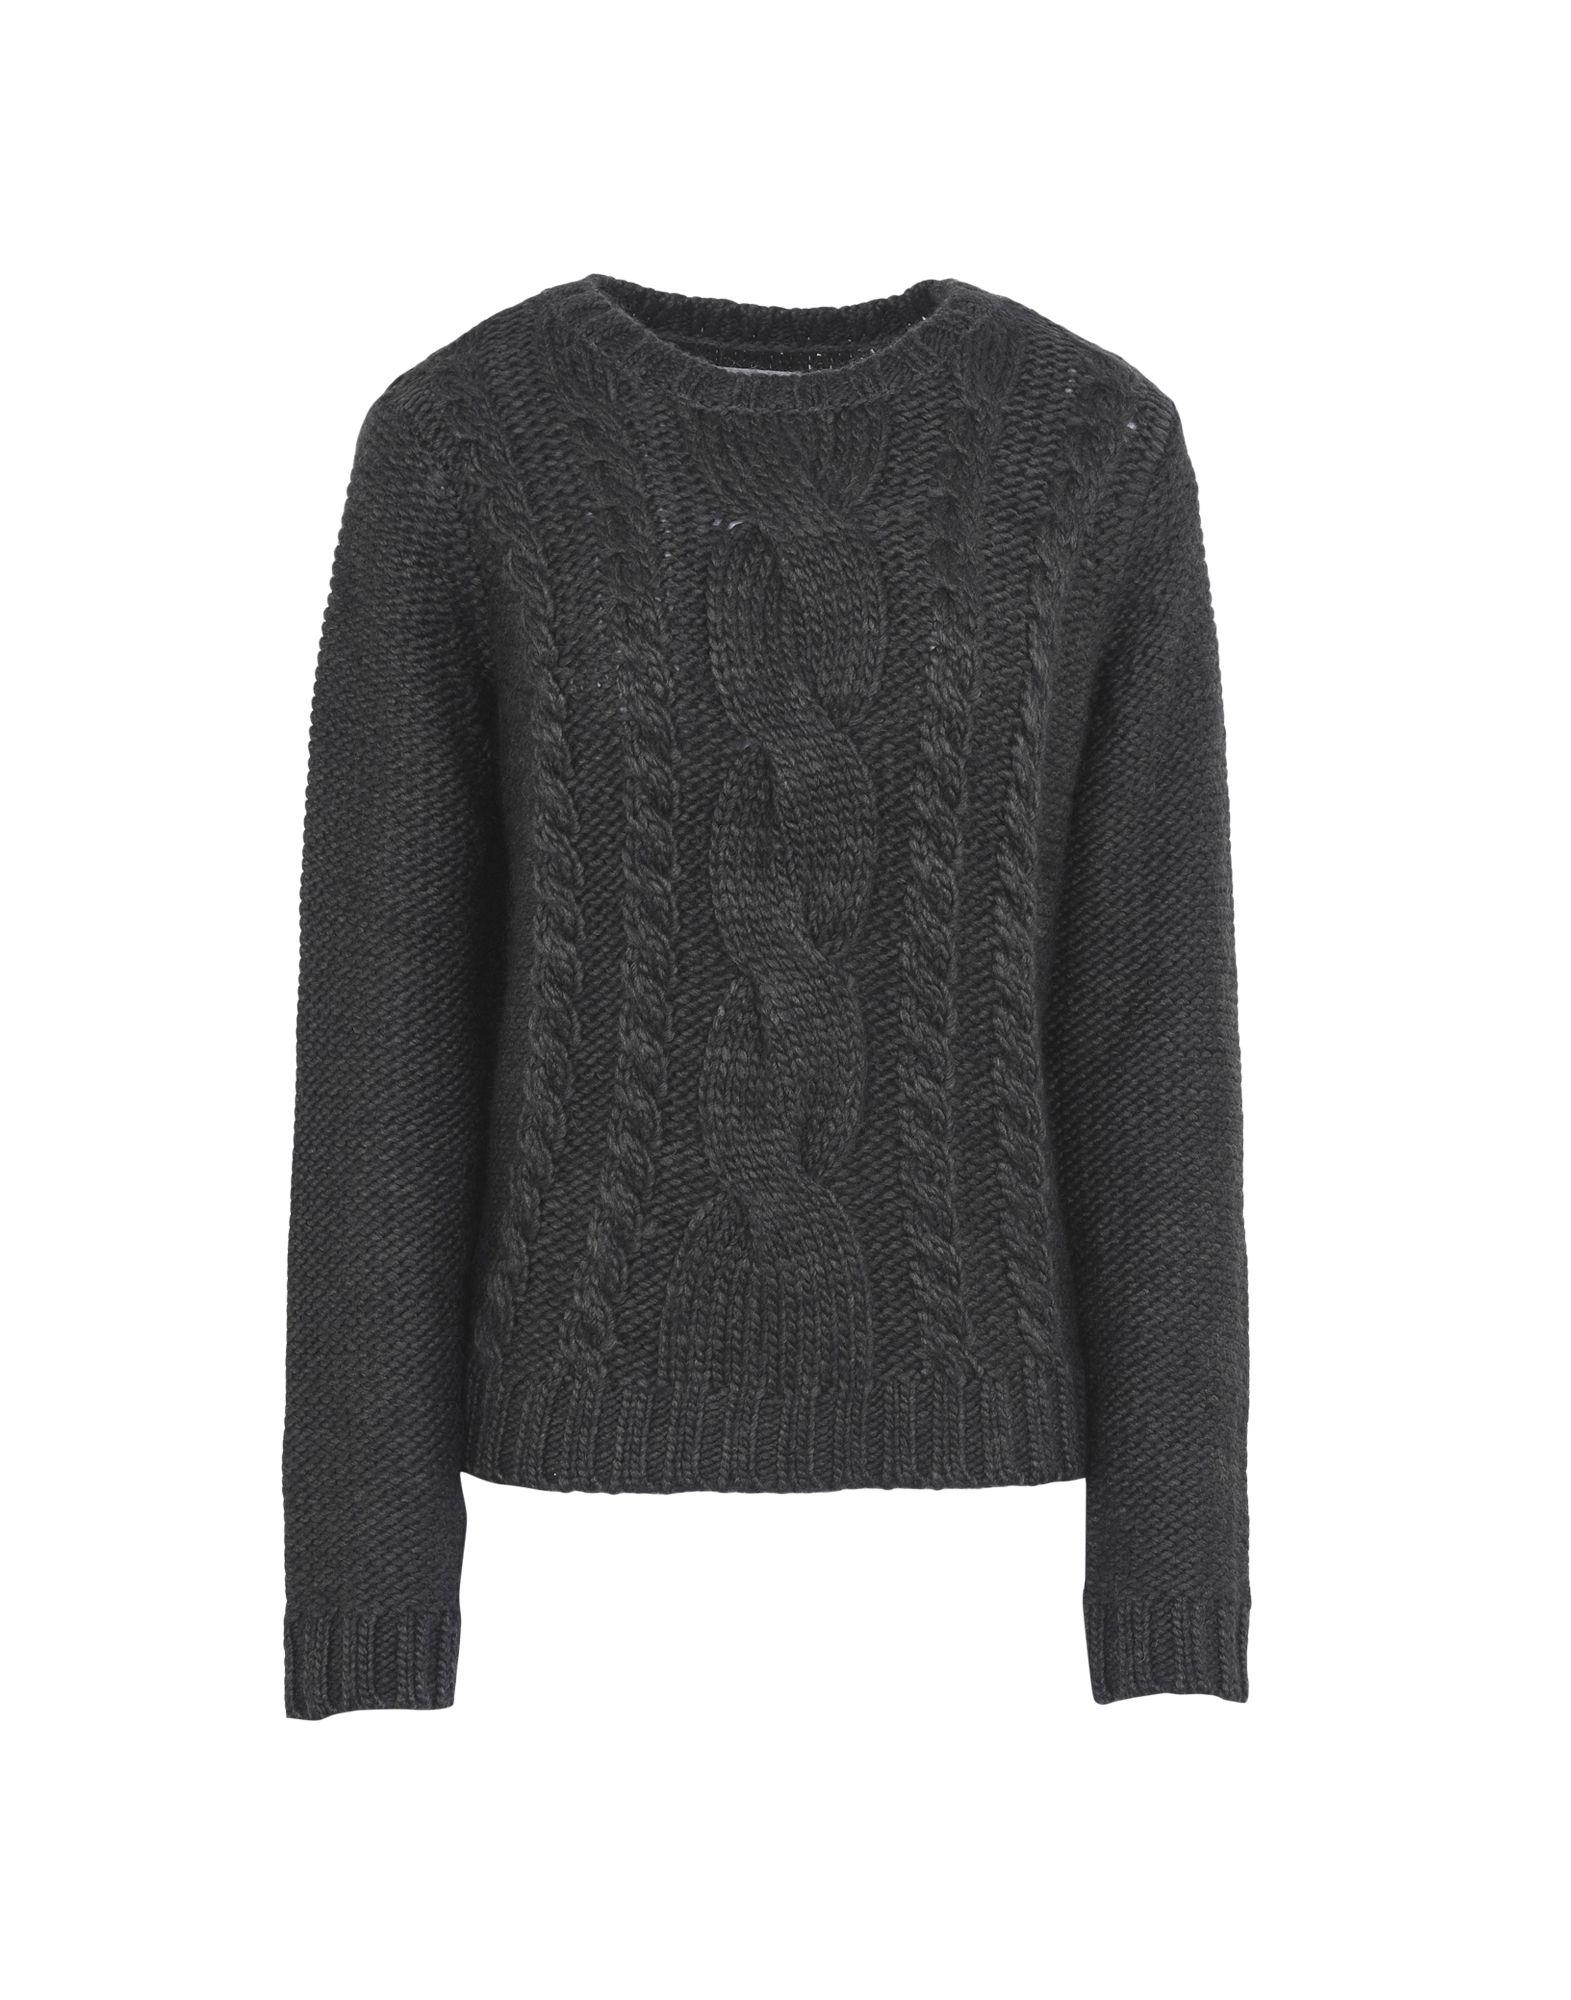 MINIMUM Свитер minimum свитер